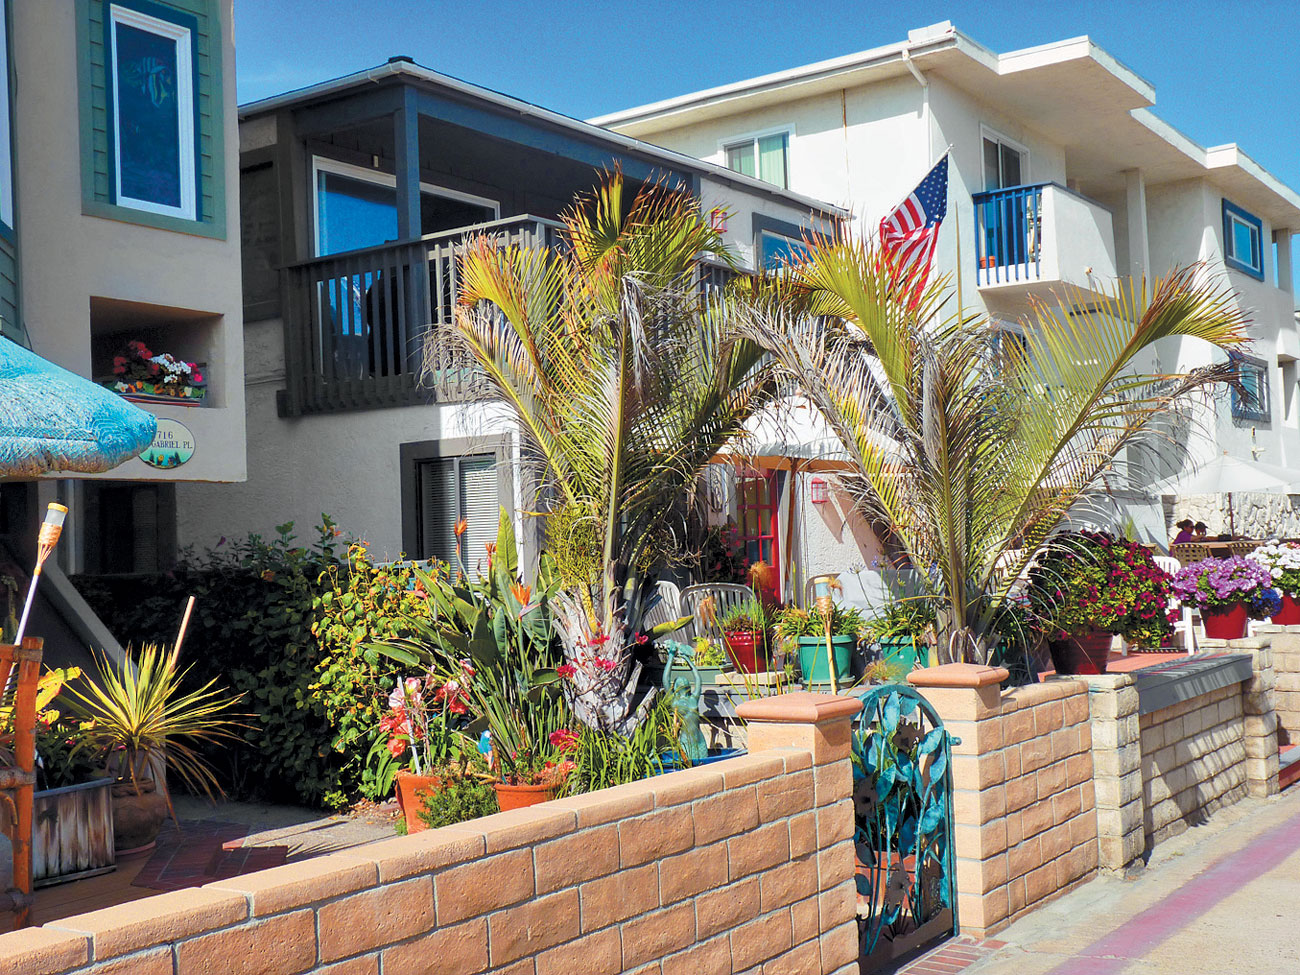 Выгода покупки недвижимости за рубежом